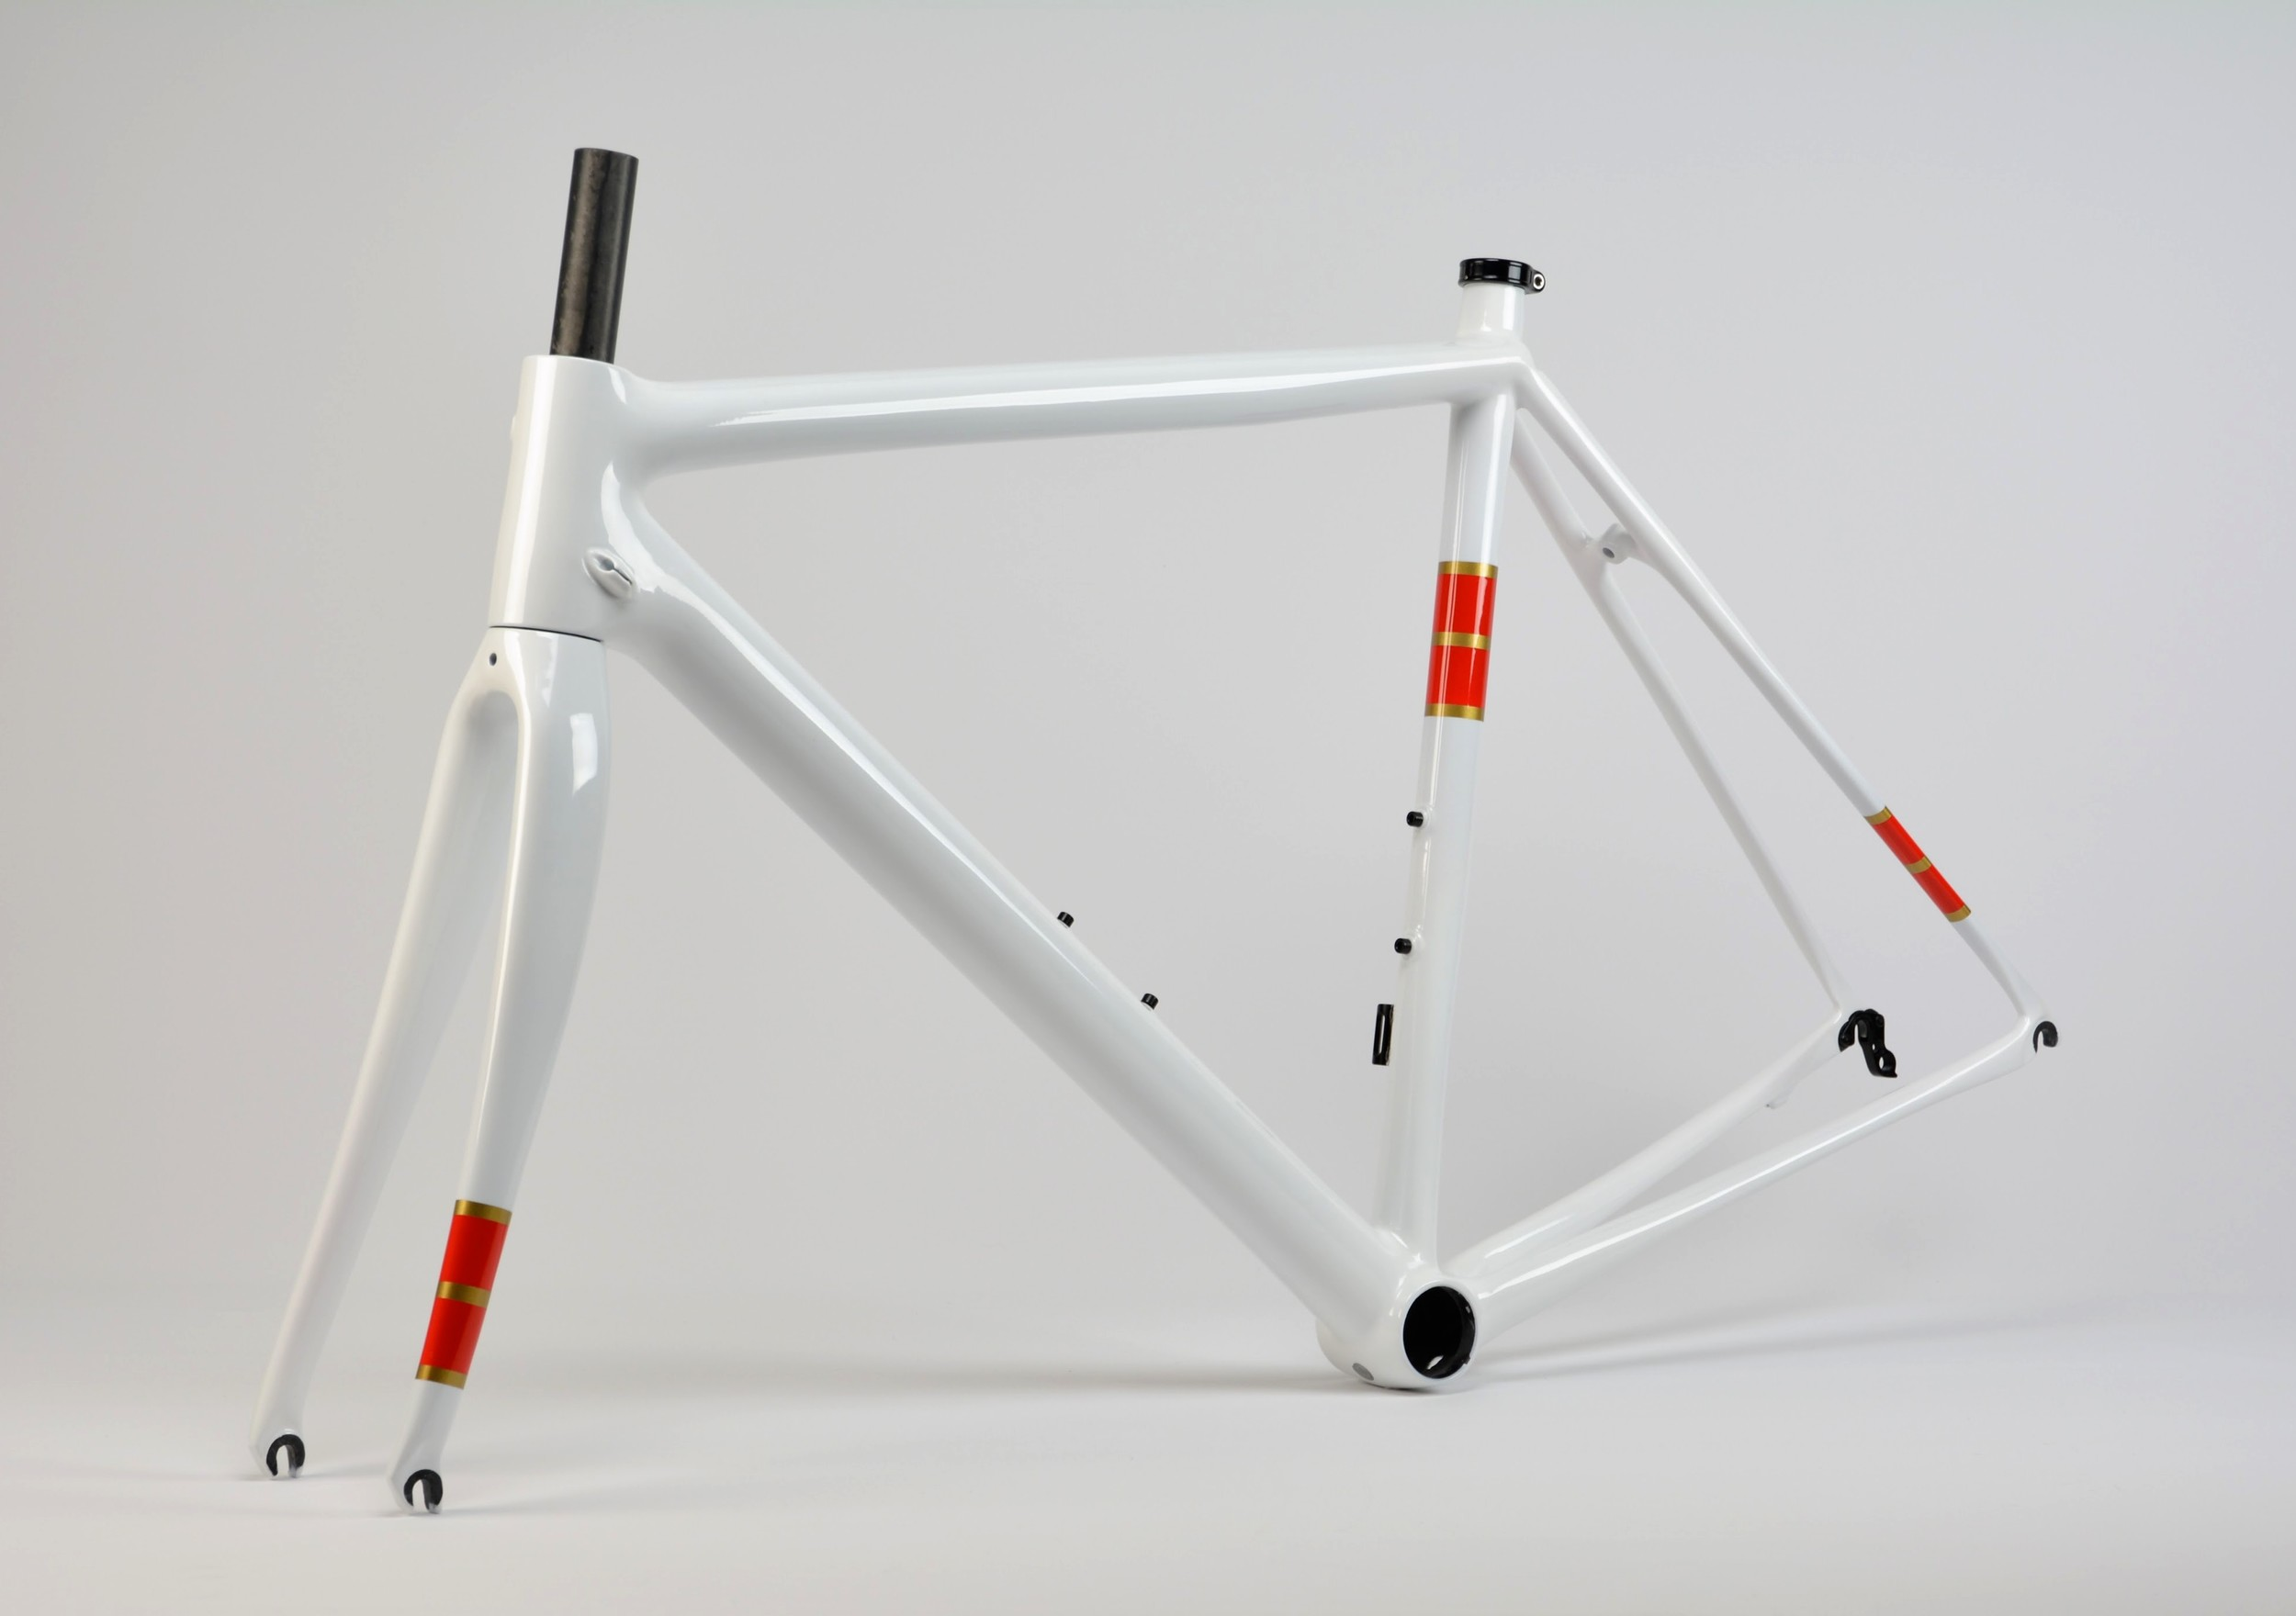 cannondale-supersix-evo-custom-paint_24563237625_o.jpg